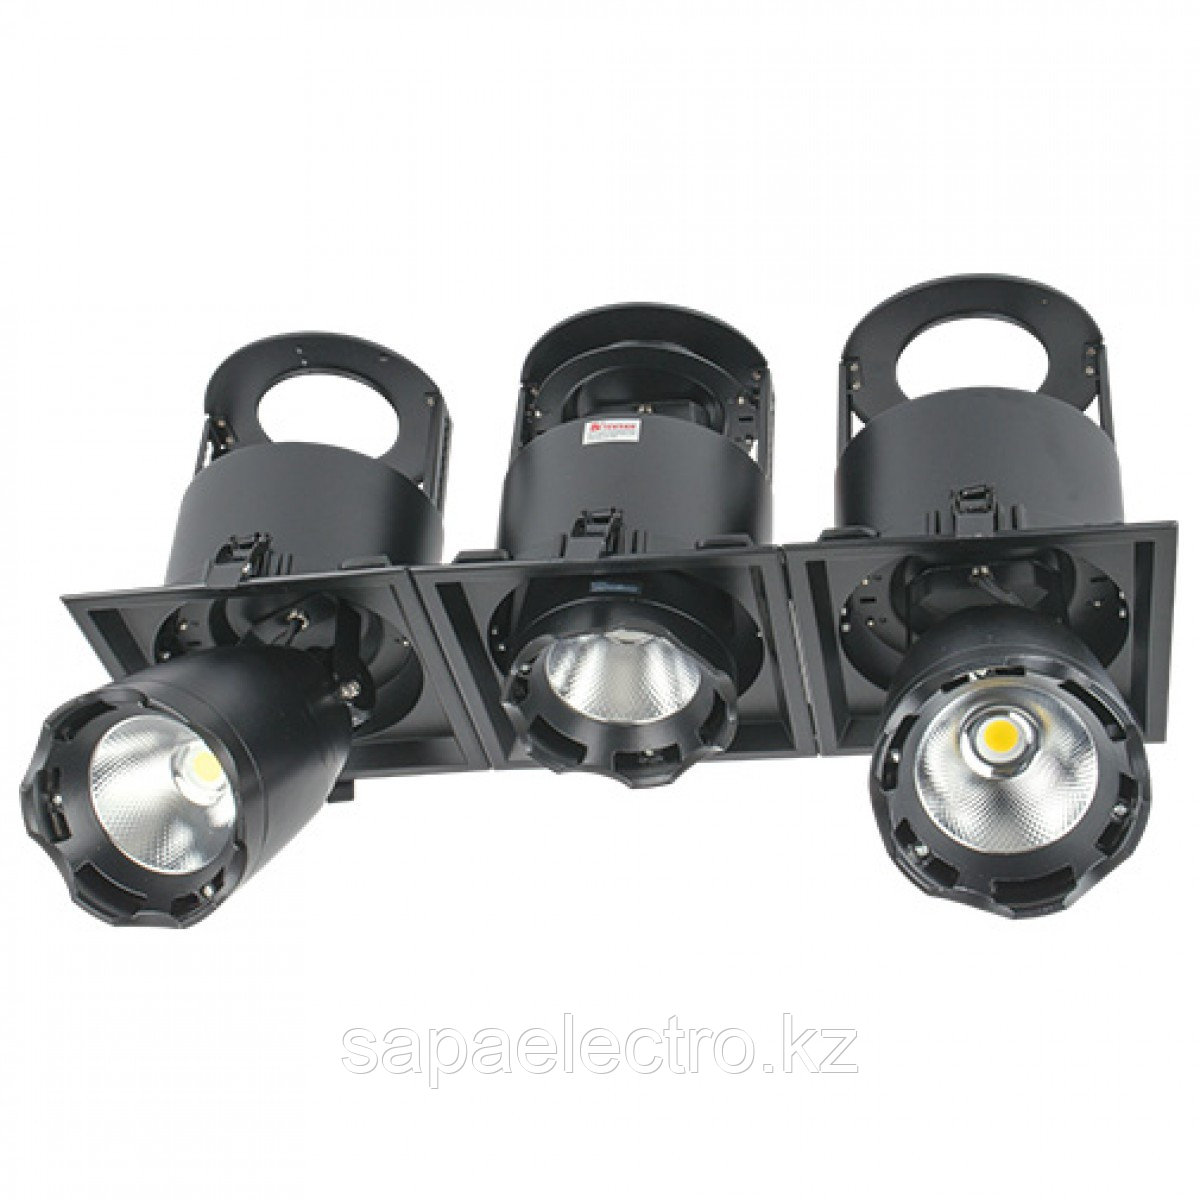 Св-к DOWNLIGHT LED LS-DK912-3 3x40W 5700K BLACK(TS)